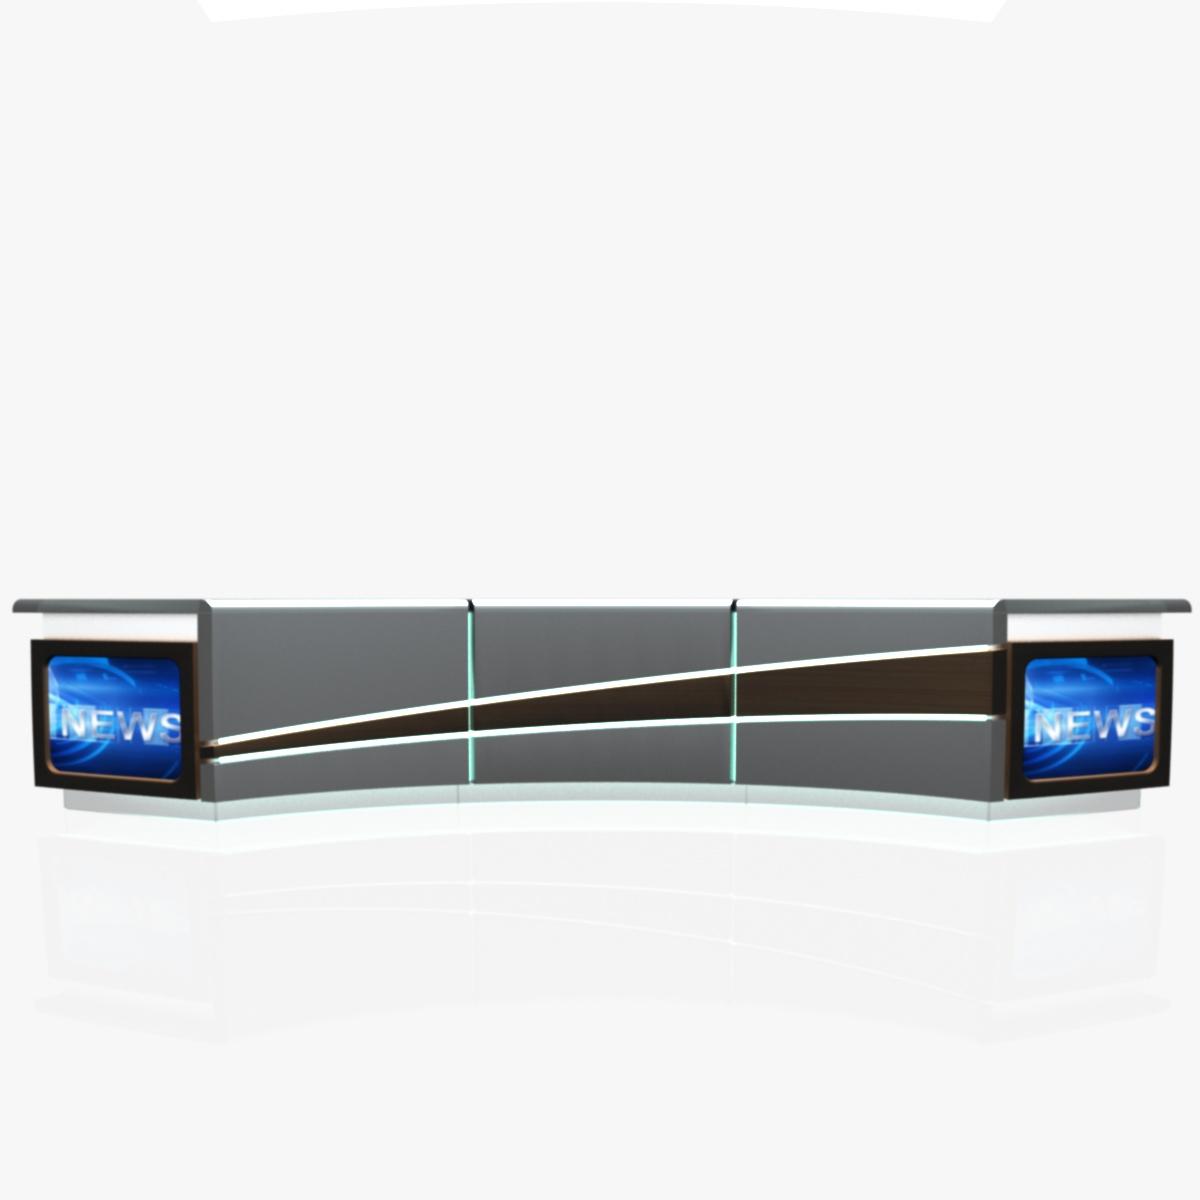 virtual tv studio news desk 4 3d model 3ds max dxf fbx  obj 215942